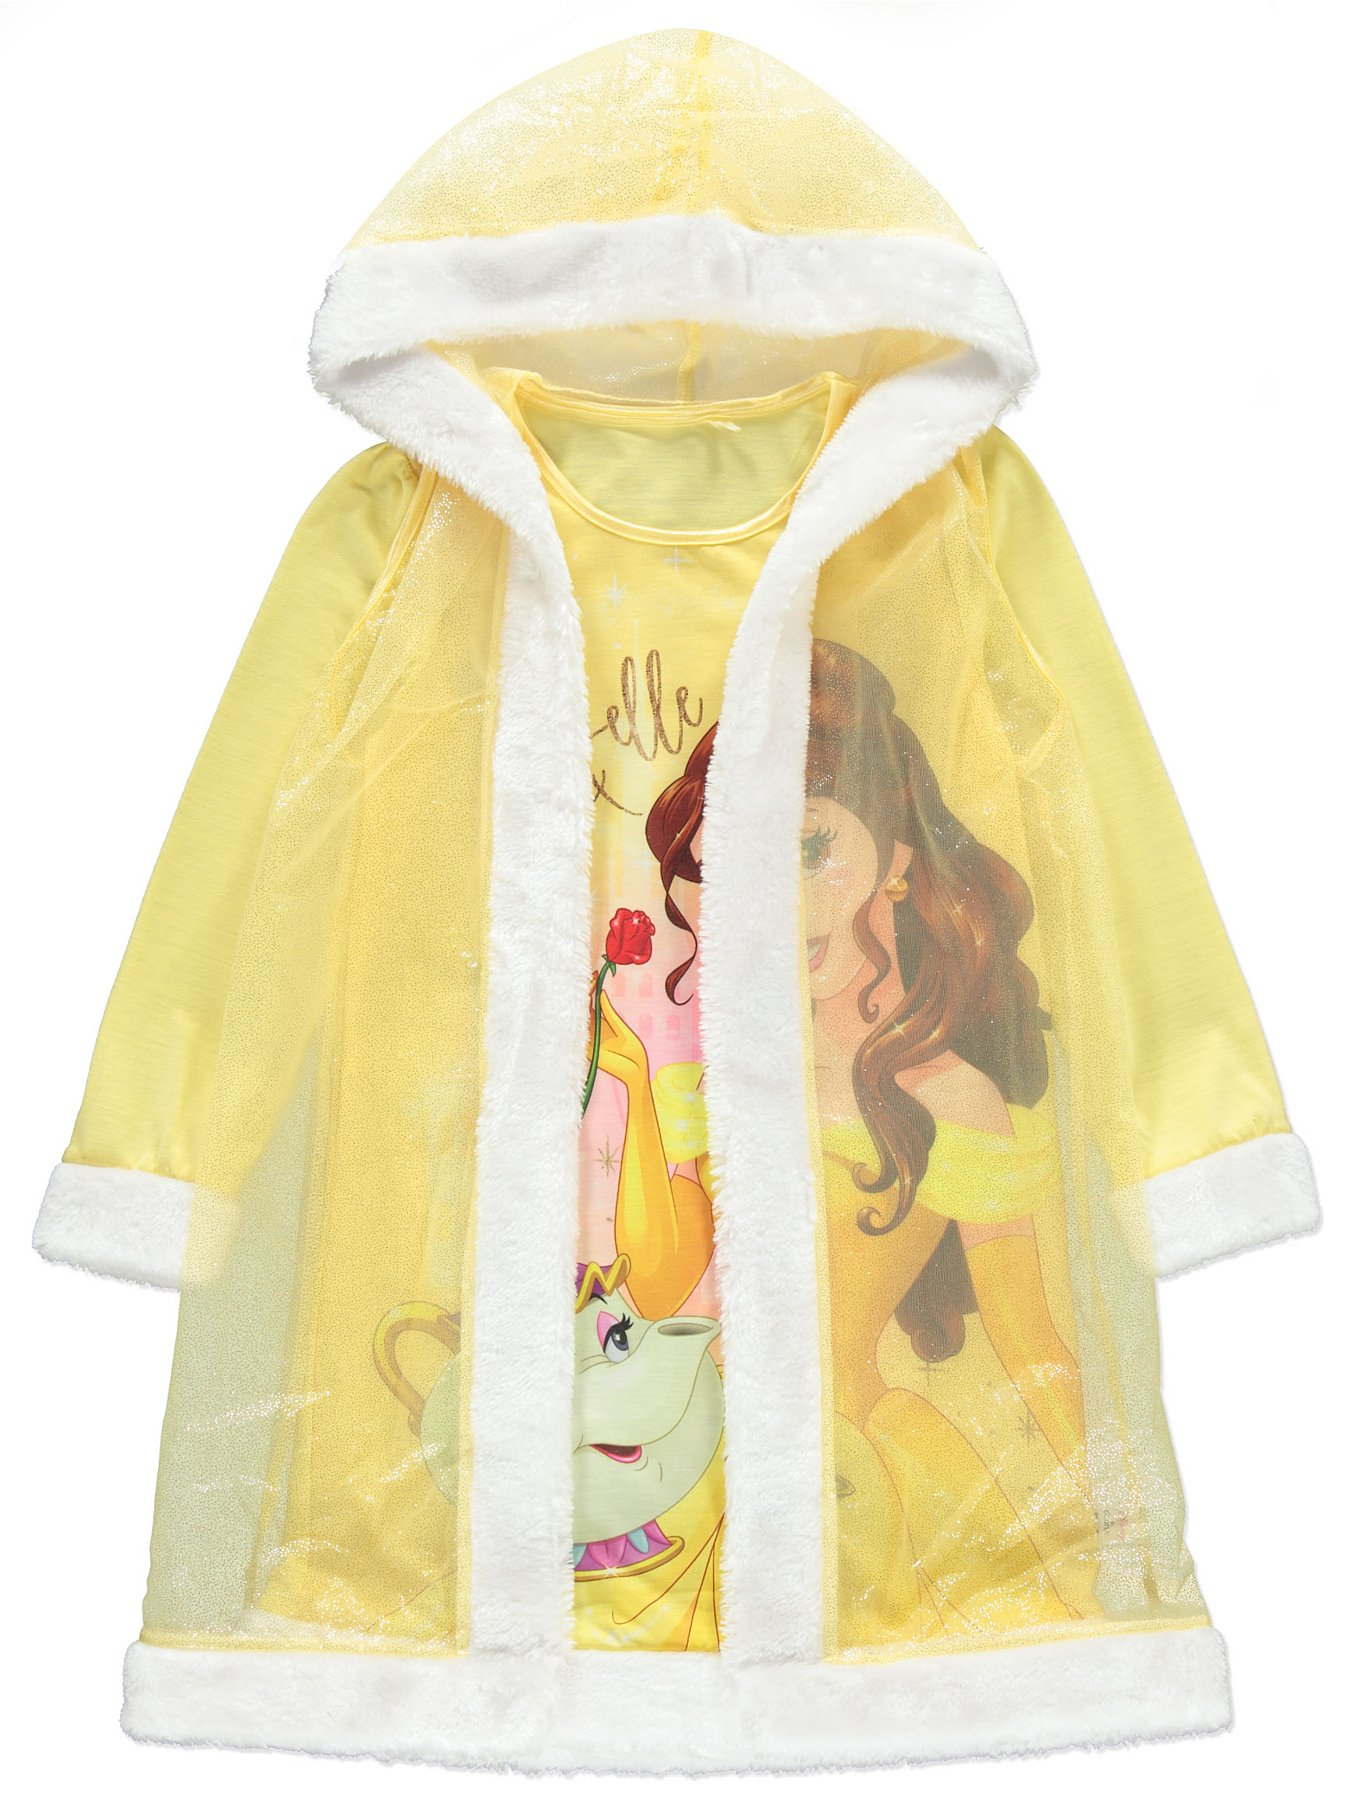 c0aa1305b Disney Princess Belle Nightdress with Cape Accessory | Kids | George